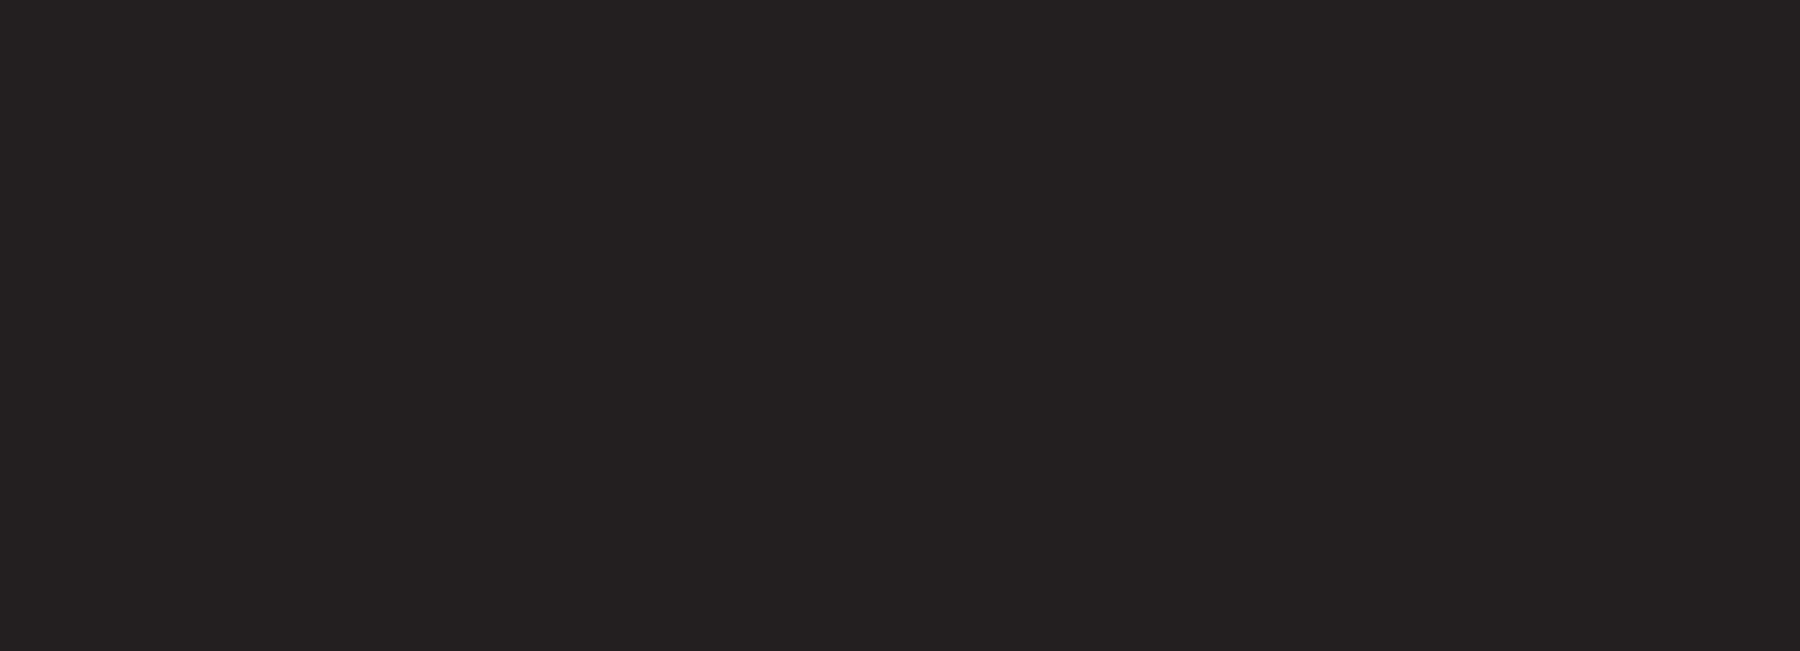 sakihiwe logo - one colour.png